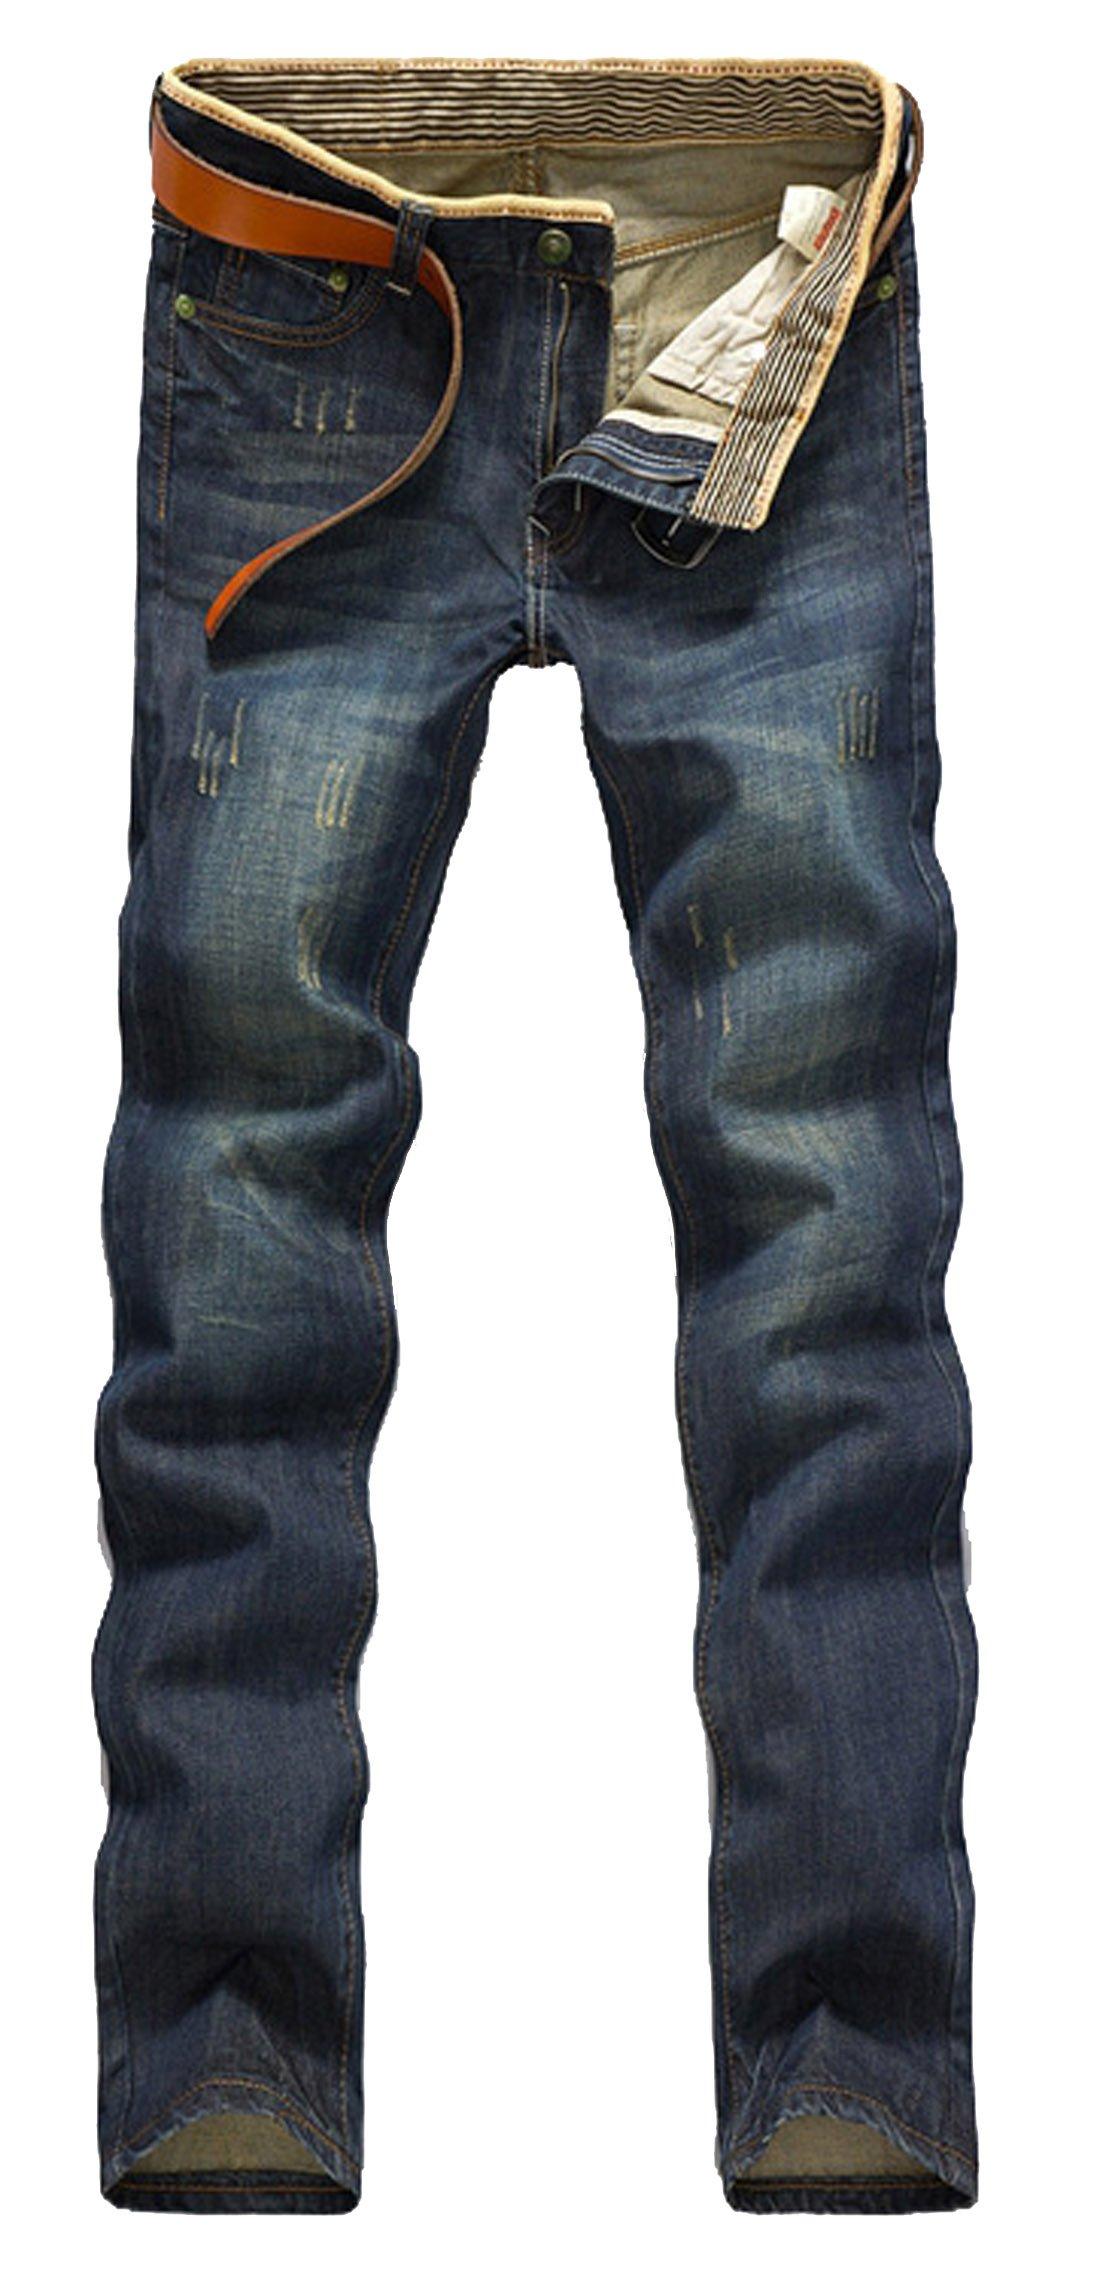 Men's Stylish Slim Fit Straight Leg Jeans Trousers